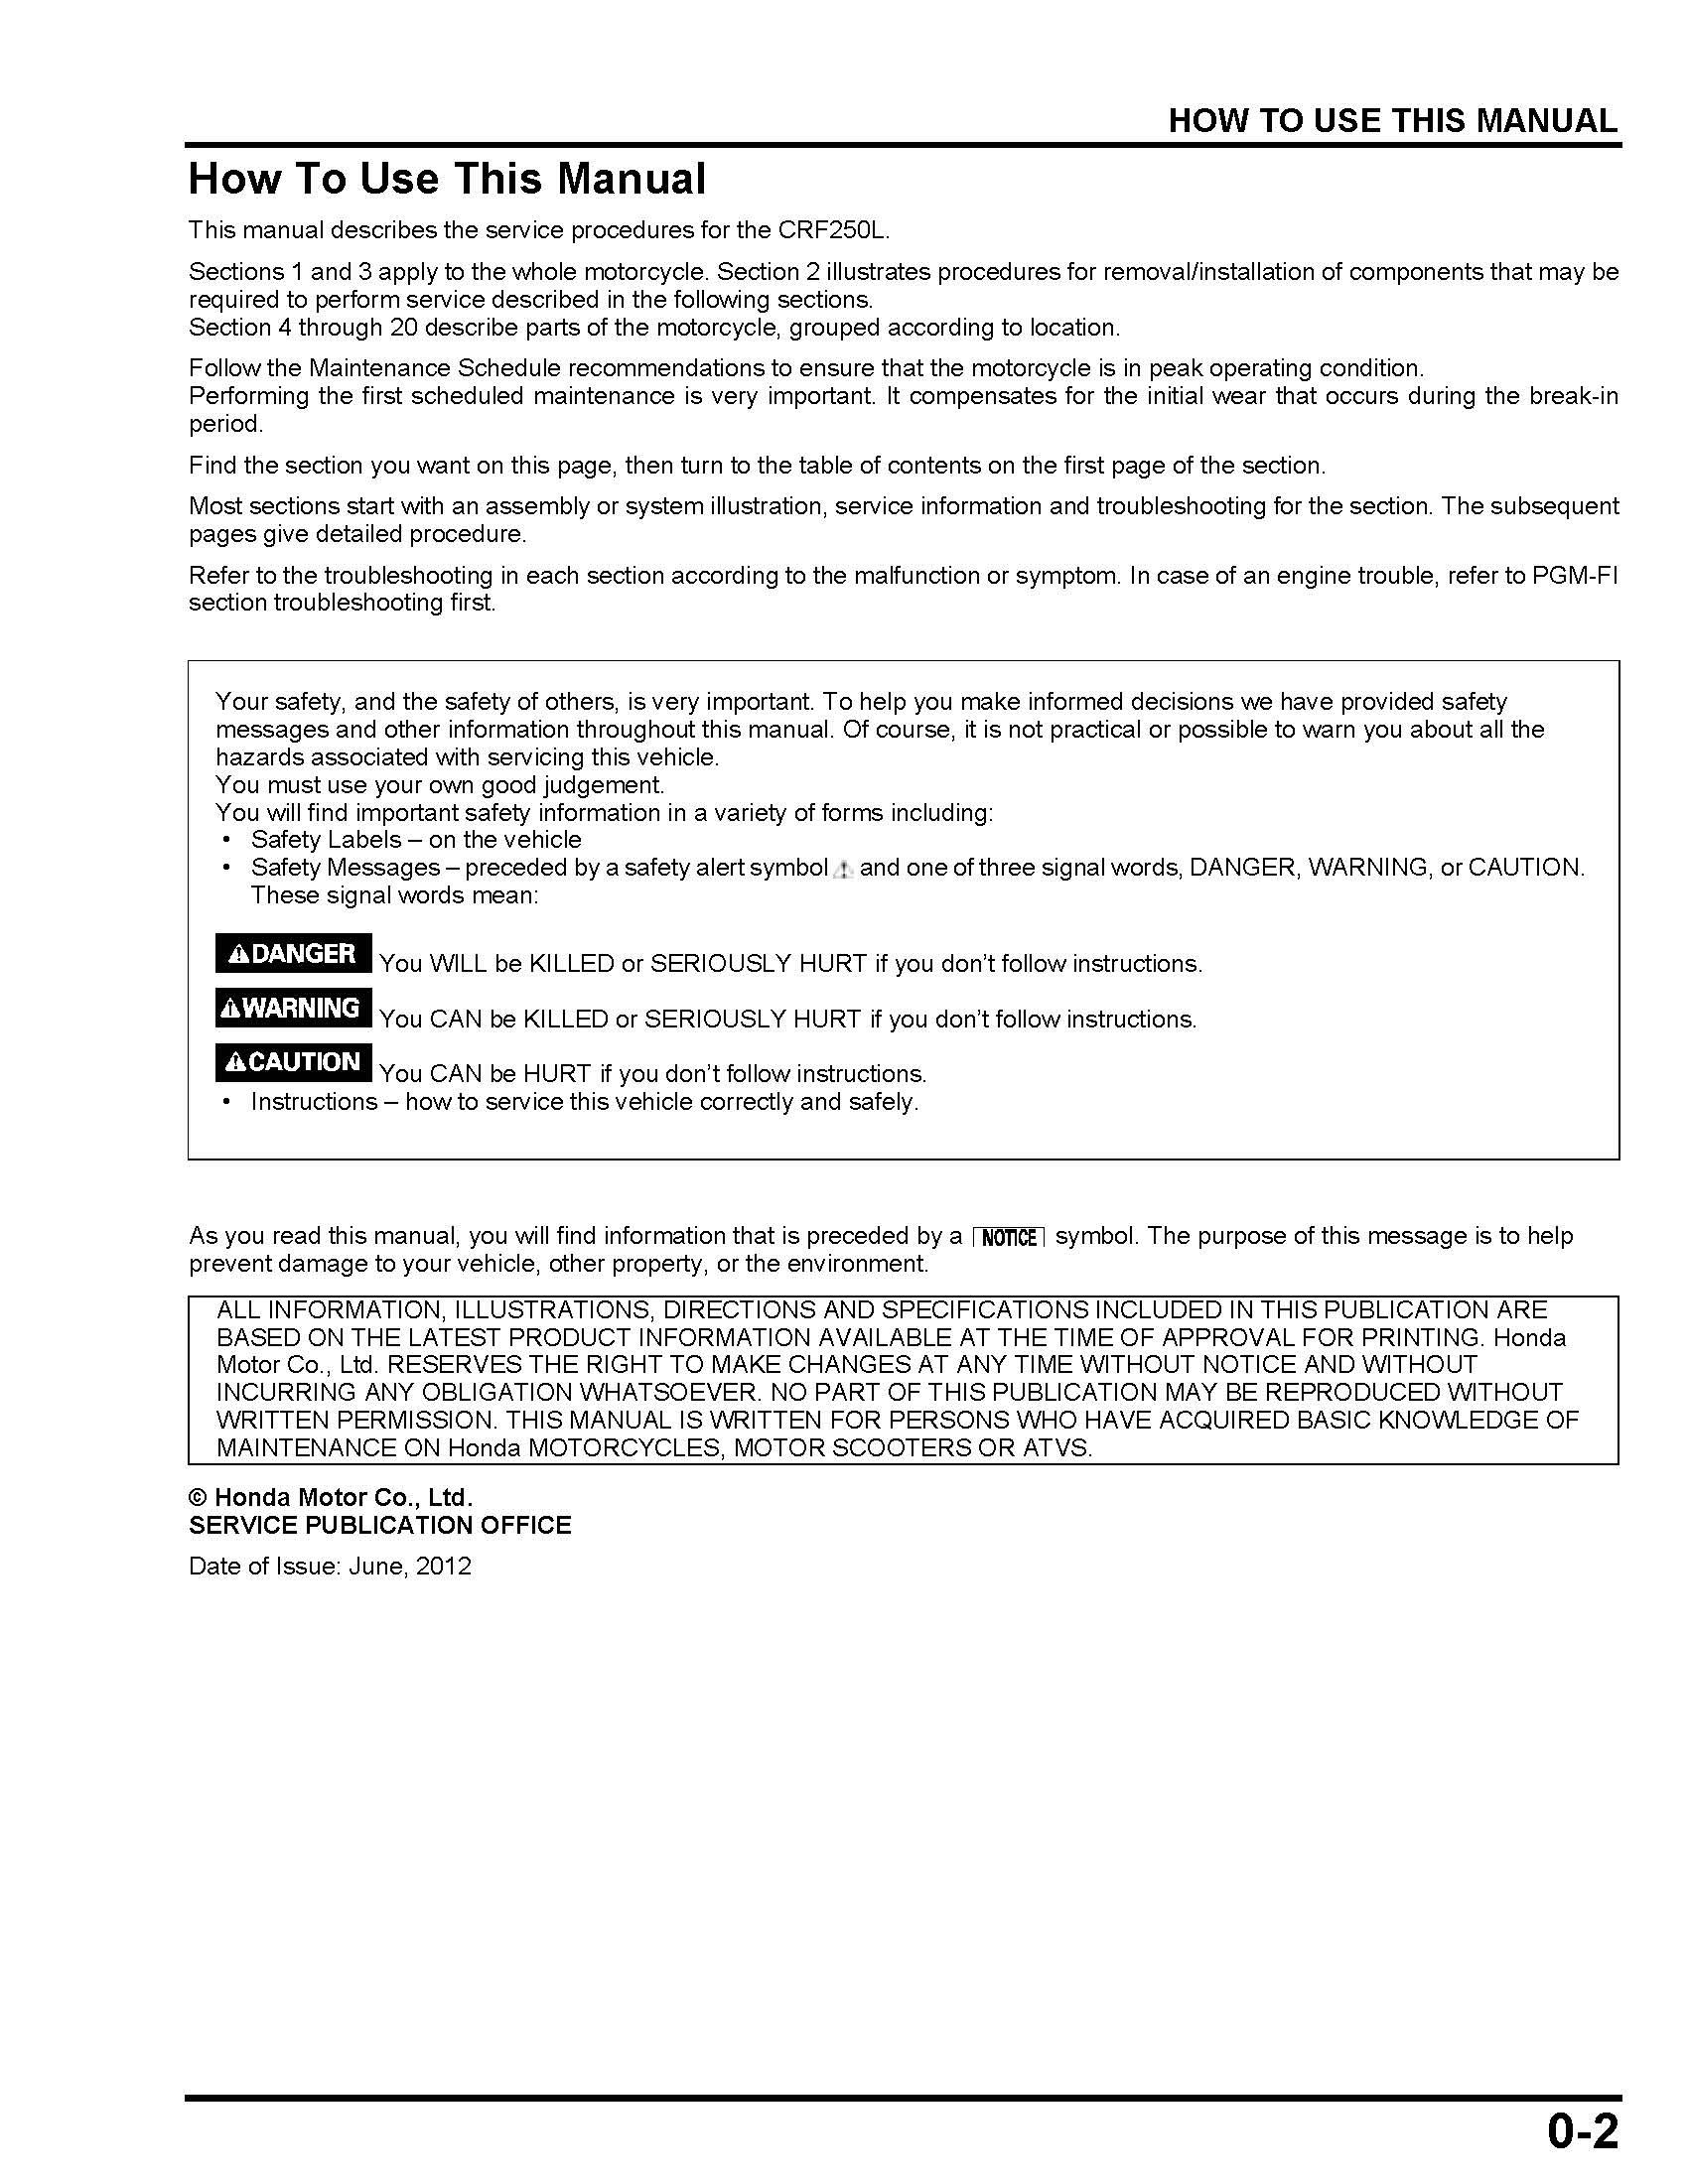 Workshop manual for Honda CRF250L (2012)